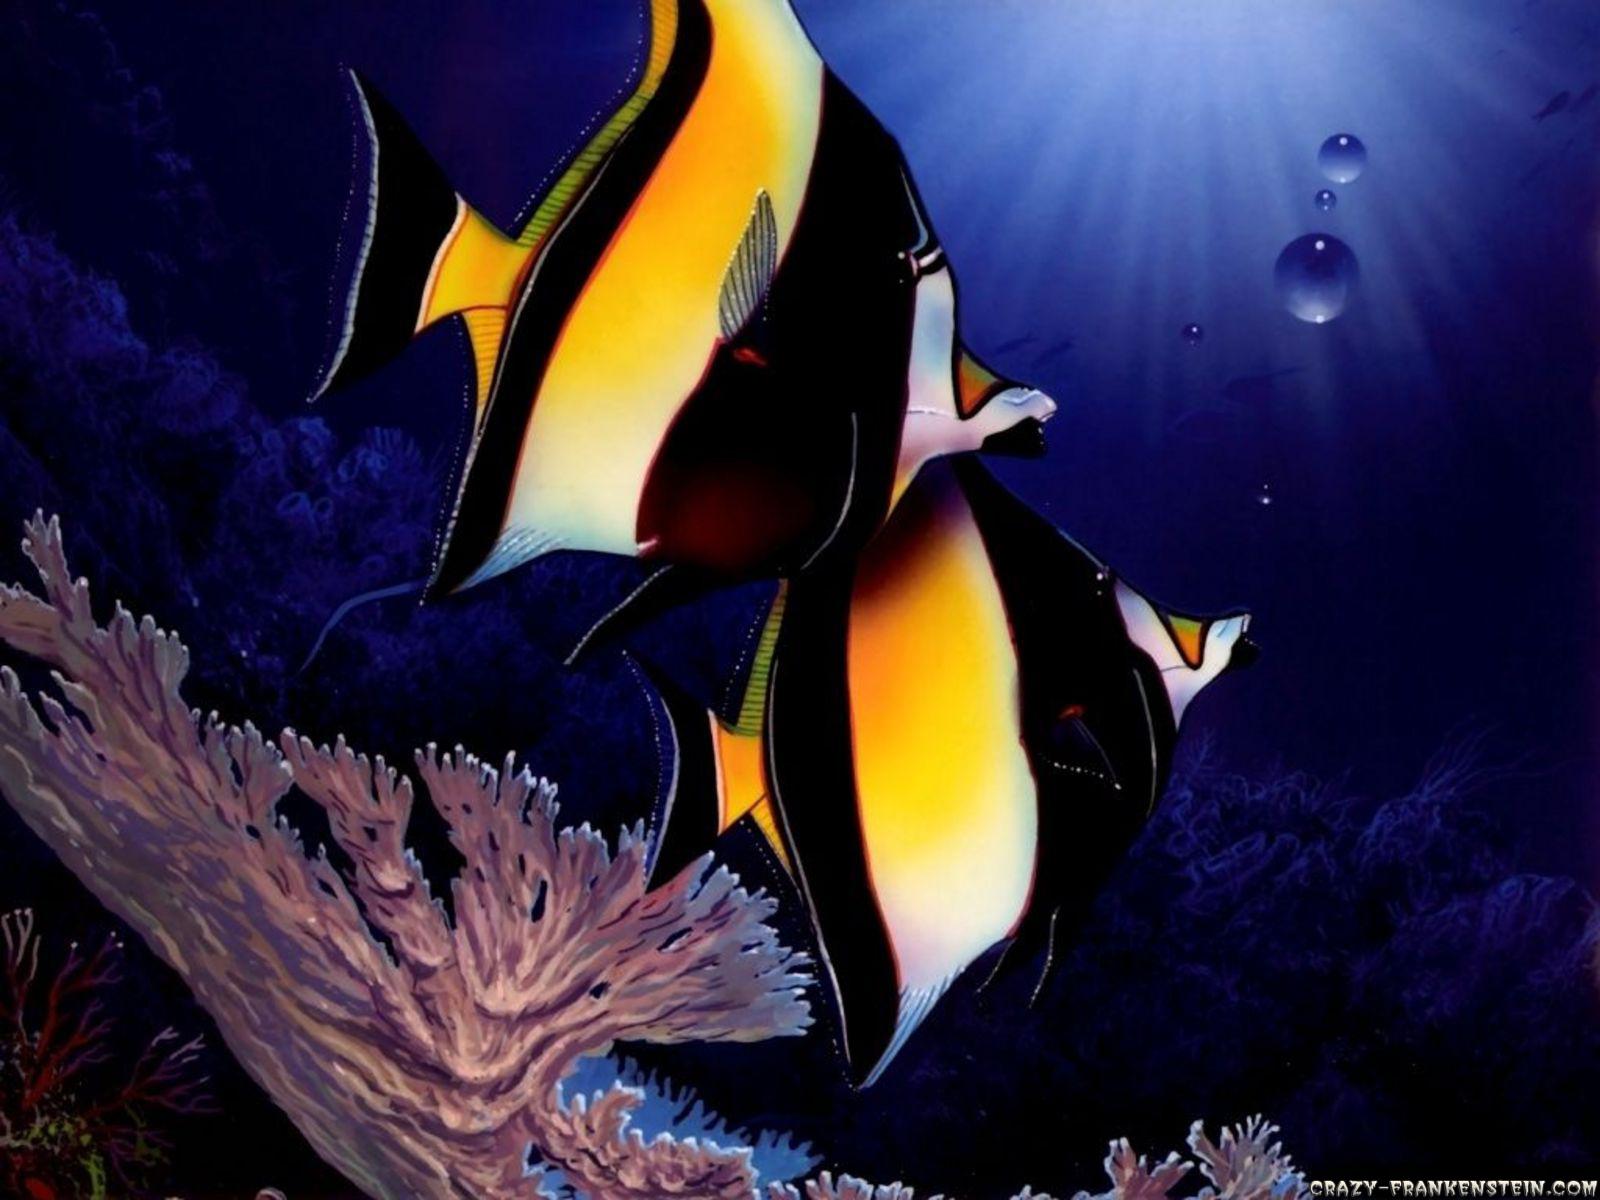 All New Wallpaper Beautiful Fish Wallpaper